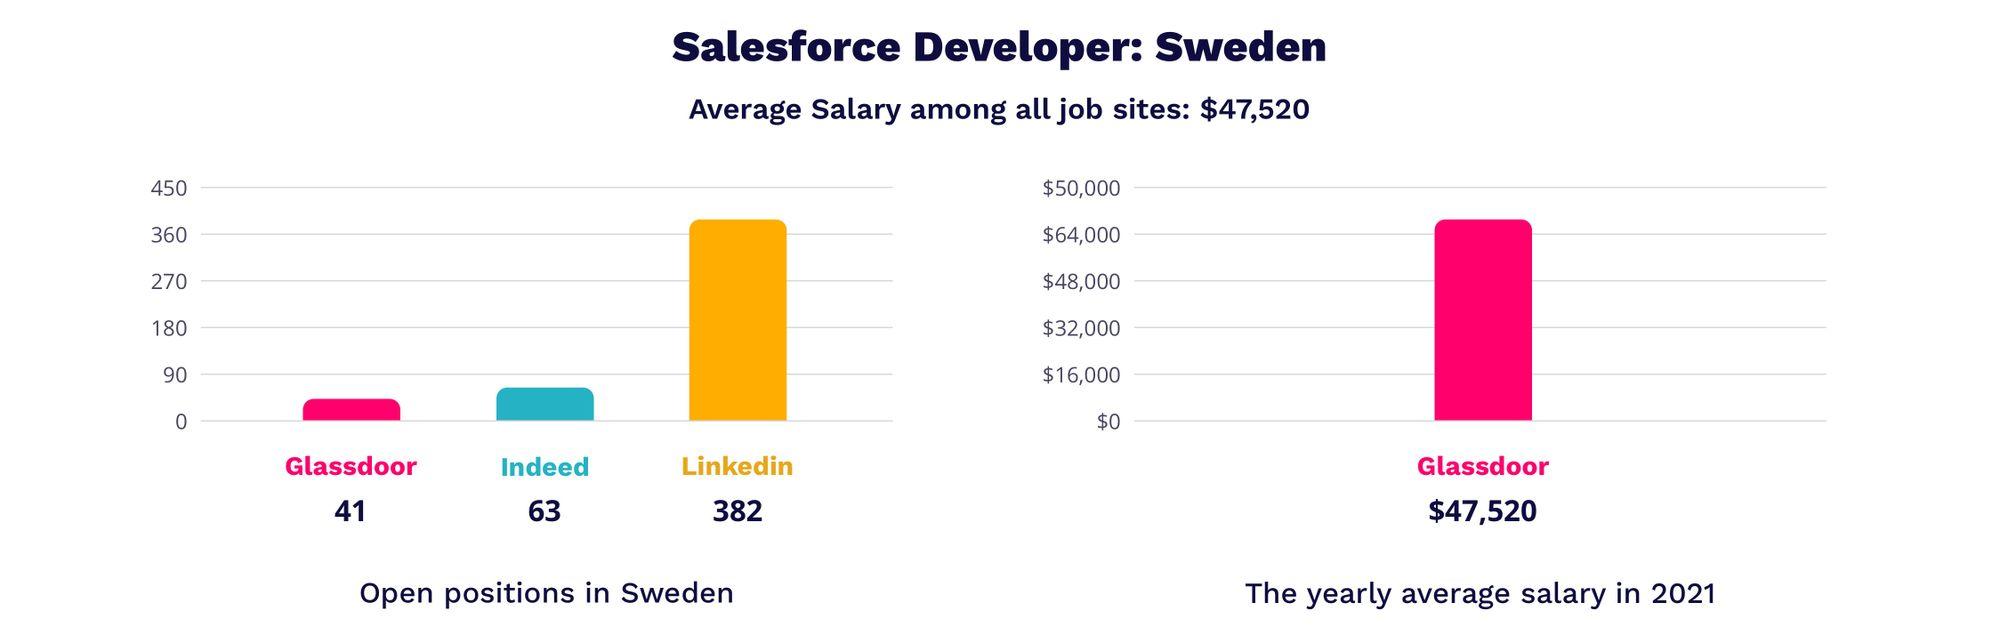 salesforce developer salaries in Sweden